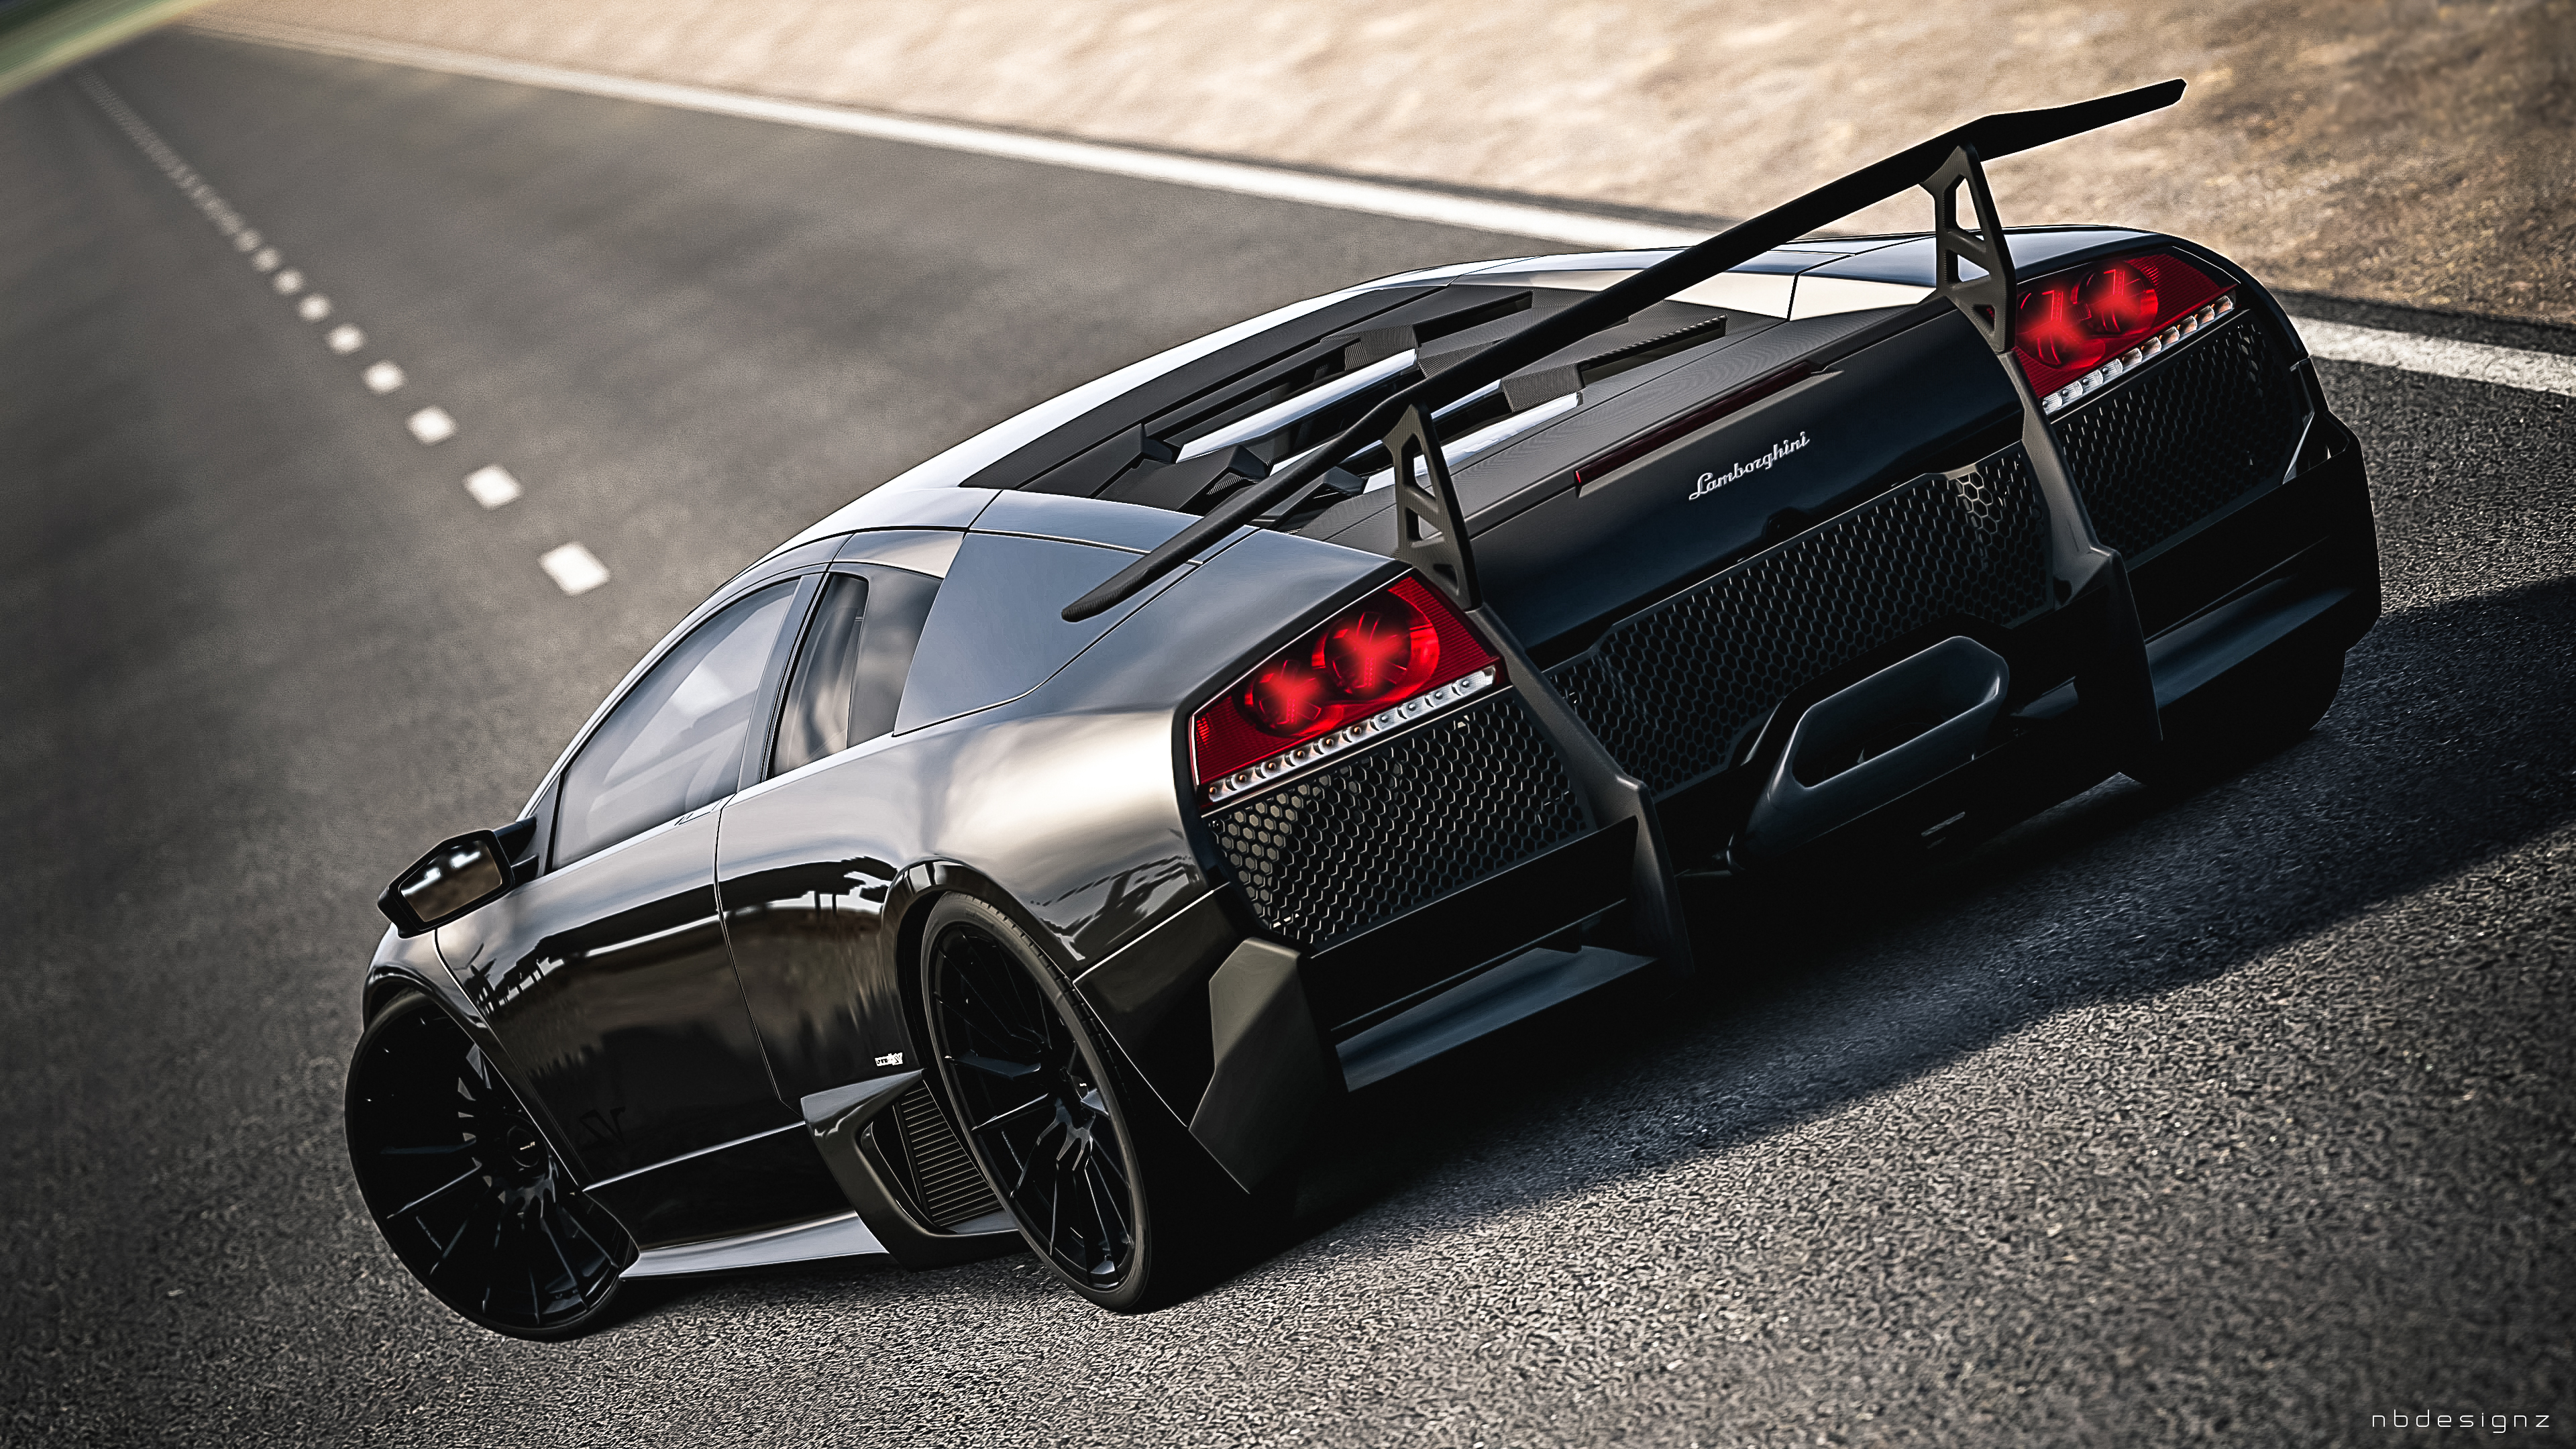 Lamborghini Murciélago 4k Ultra HD Wallpaper   Background ...